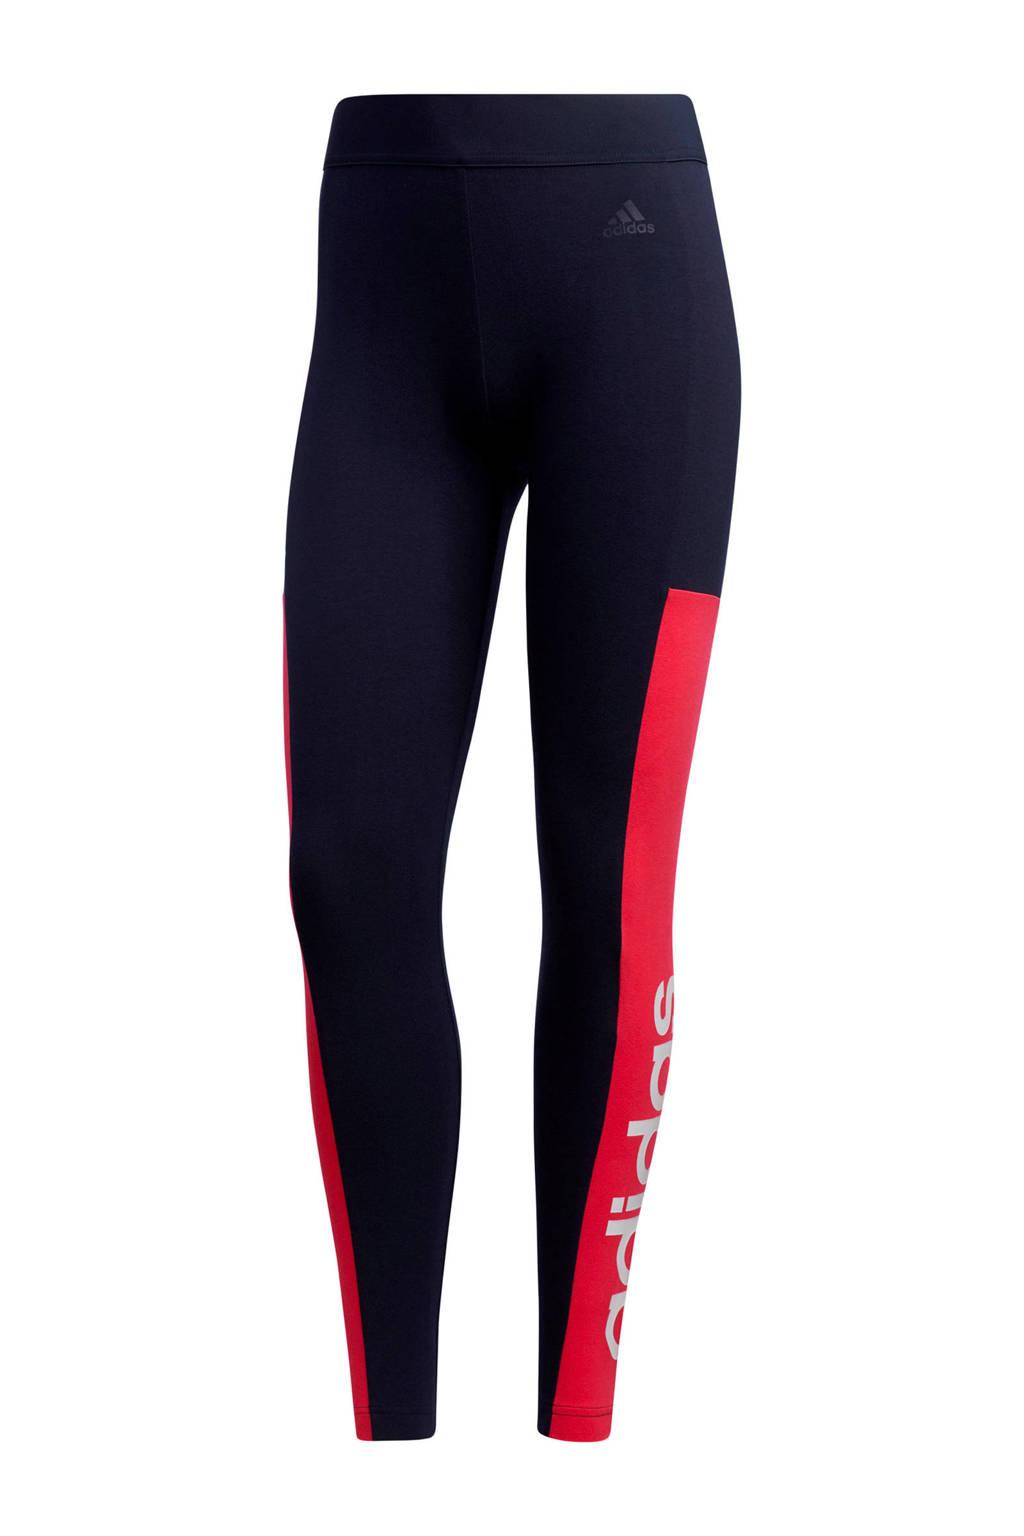 adidas Performance sportbroek donkerblauw/roze, Donkerblauw/roze